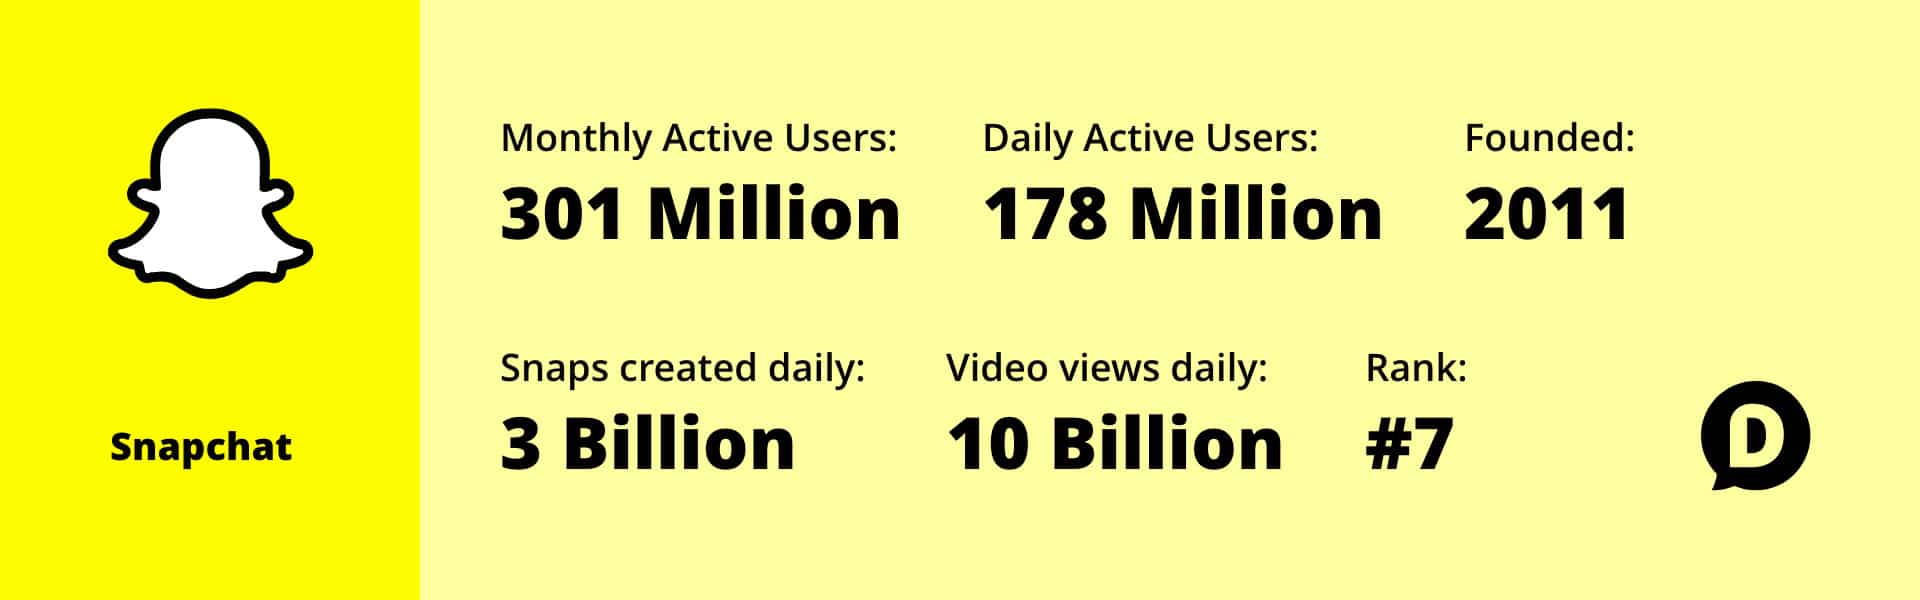 Snapchat statistics for 2018